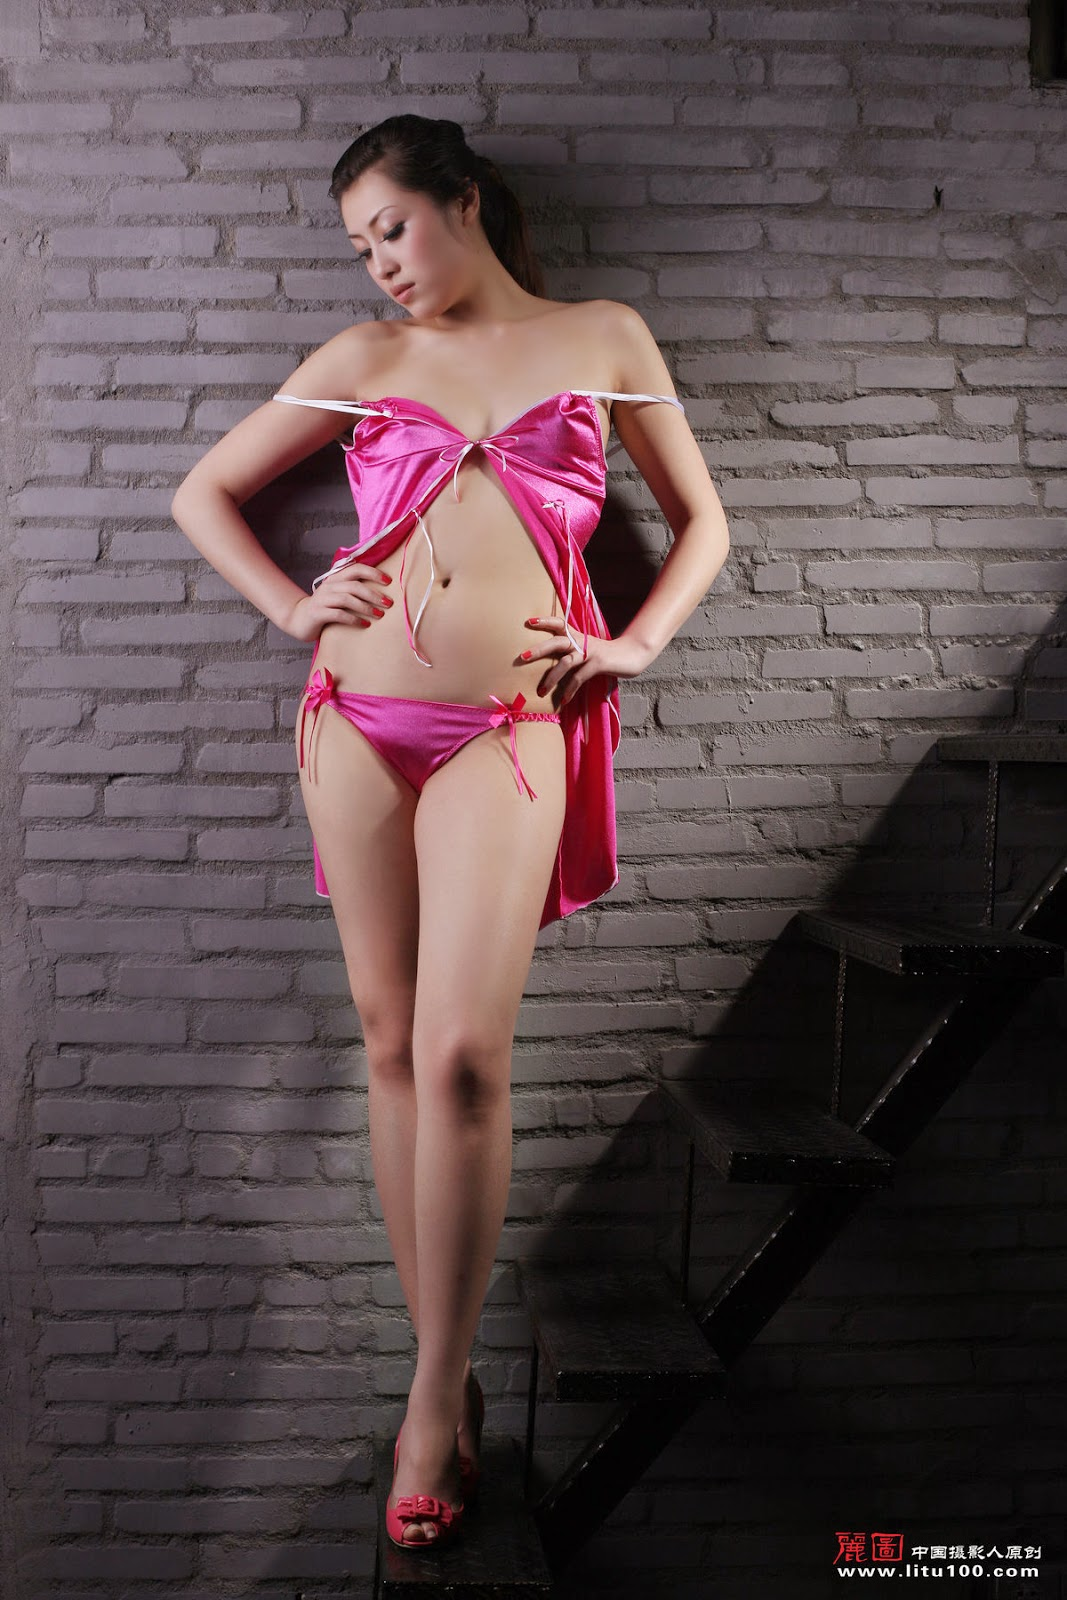 Chinese Nude Model Bing Yi [Litu100] | chinesenudeart